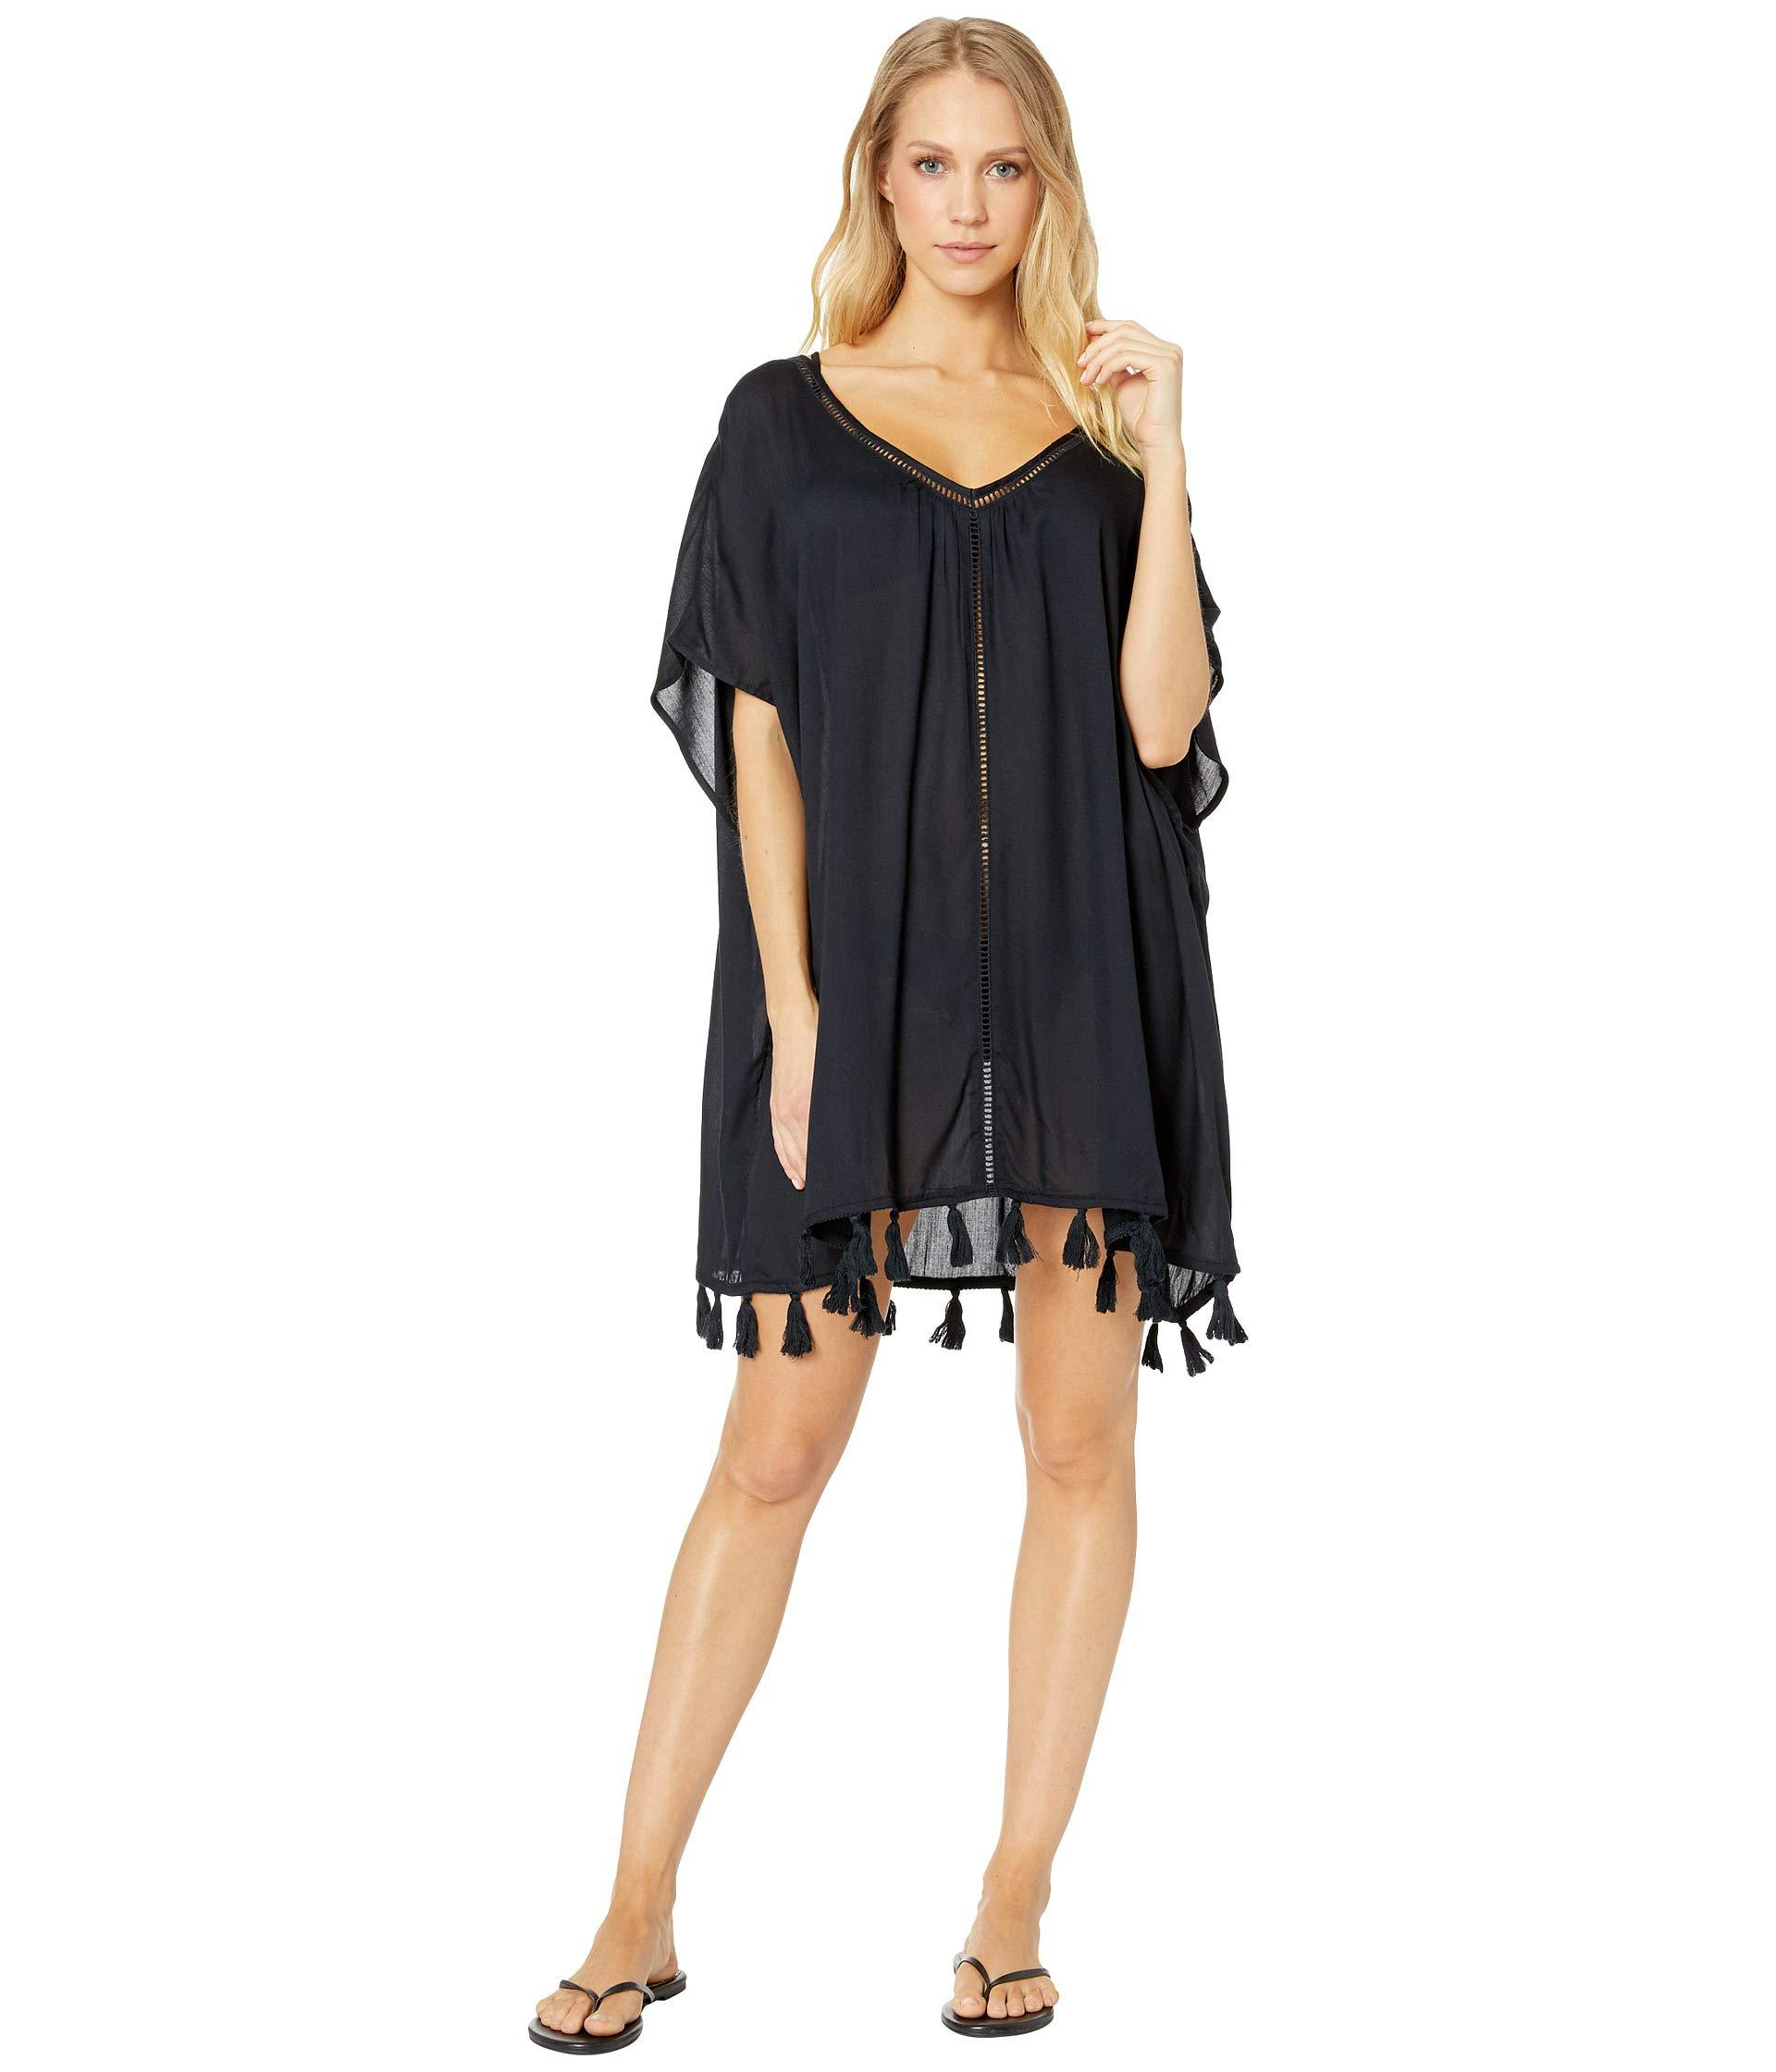 9632f2f4c98da Lyst - Roxy Poncho Cover-up Swimsuit Dress (true Black) Women s ...